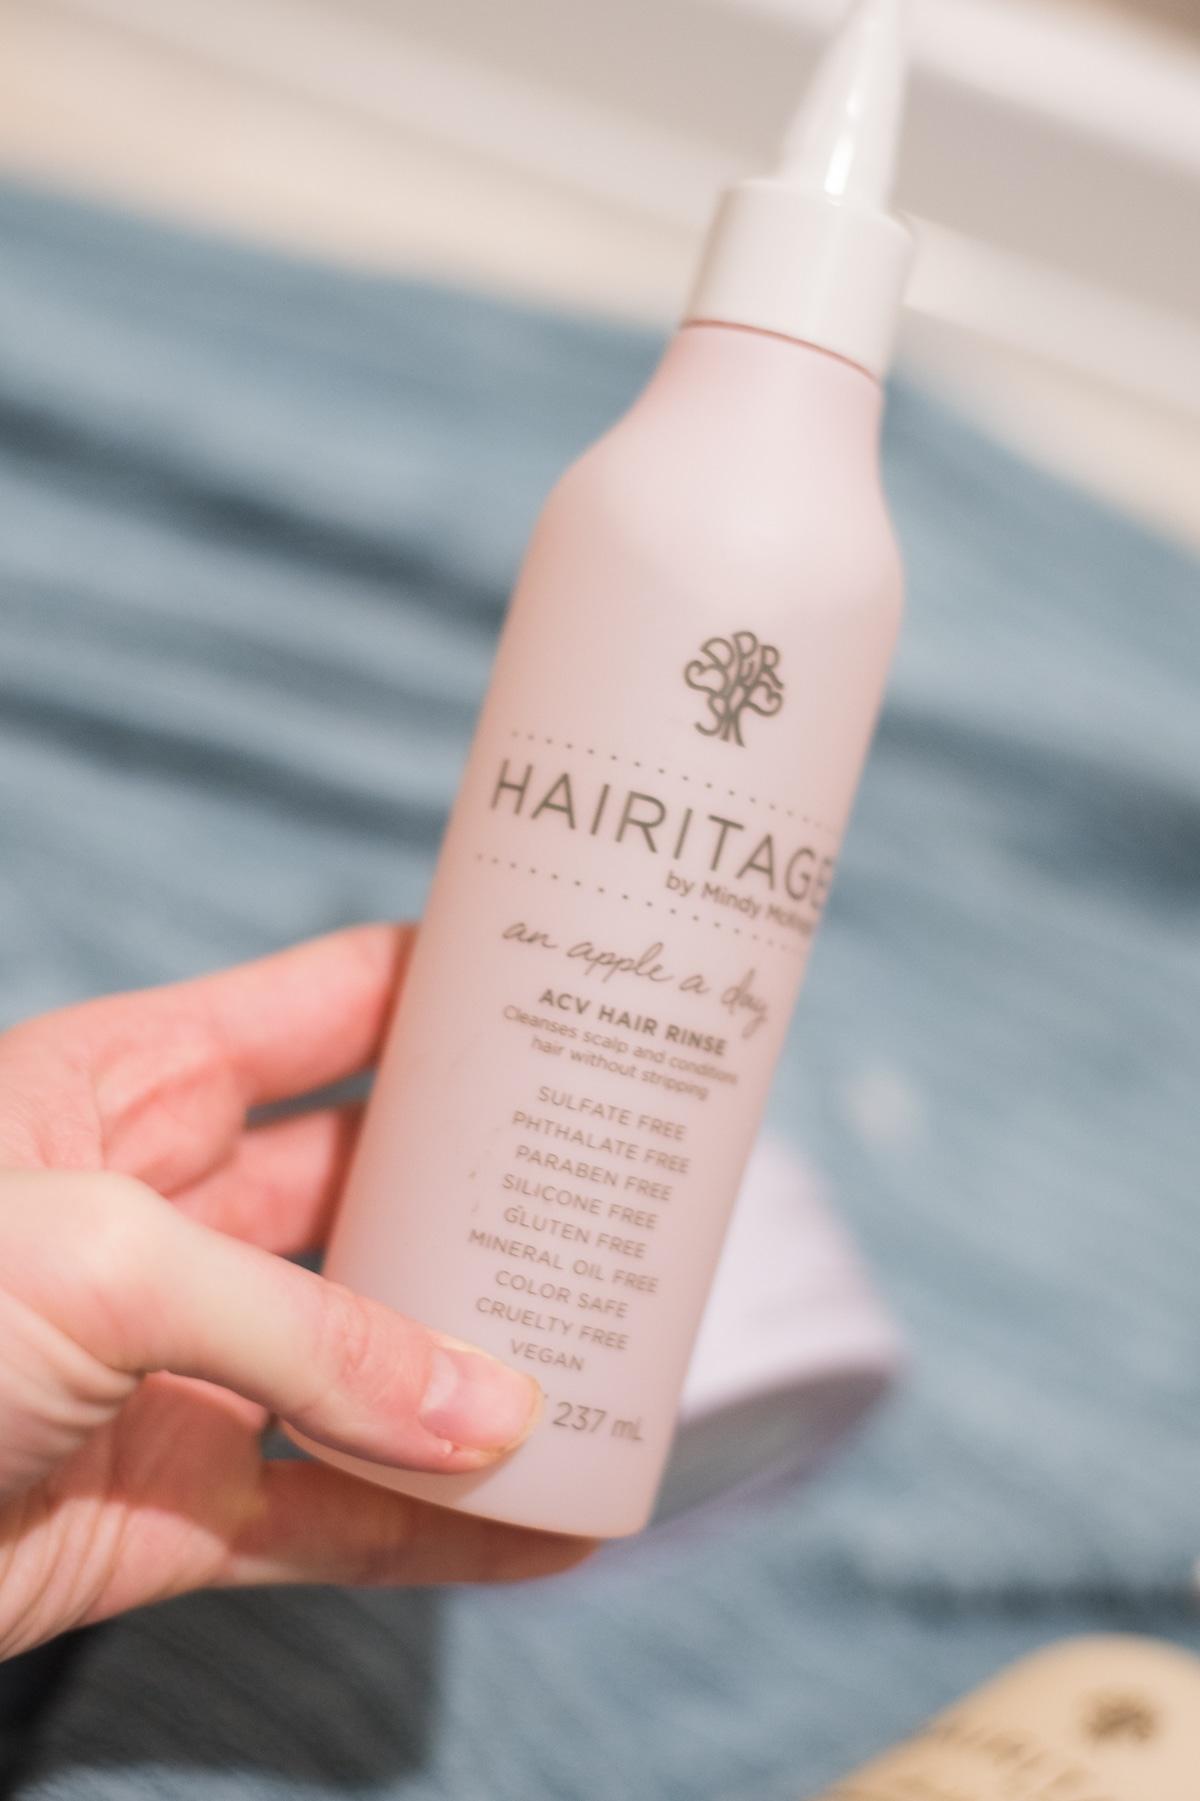 A close up of a shampoo bottle